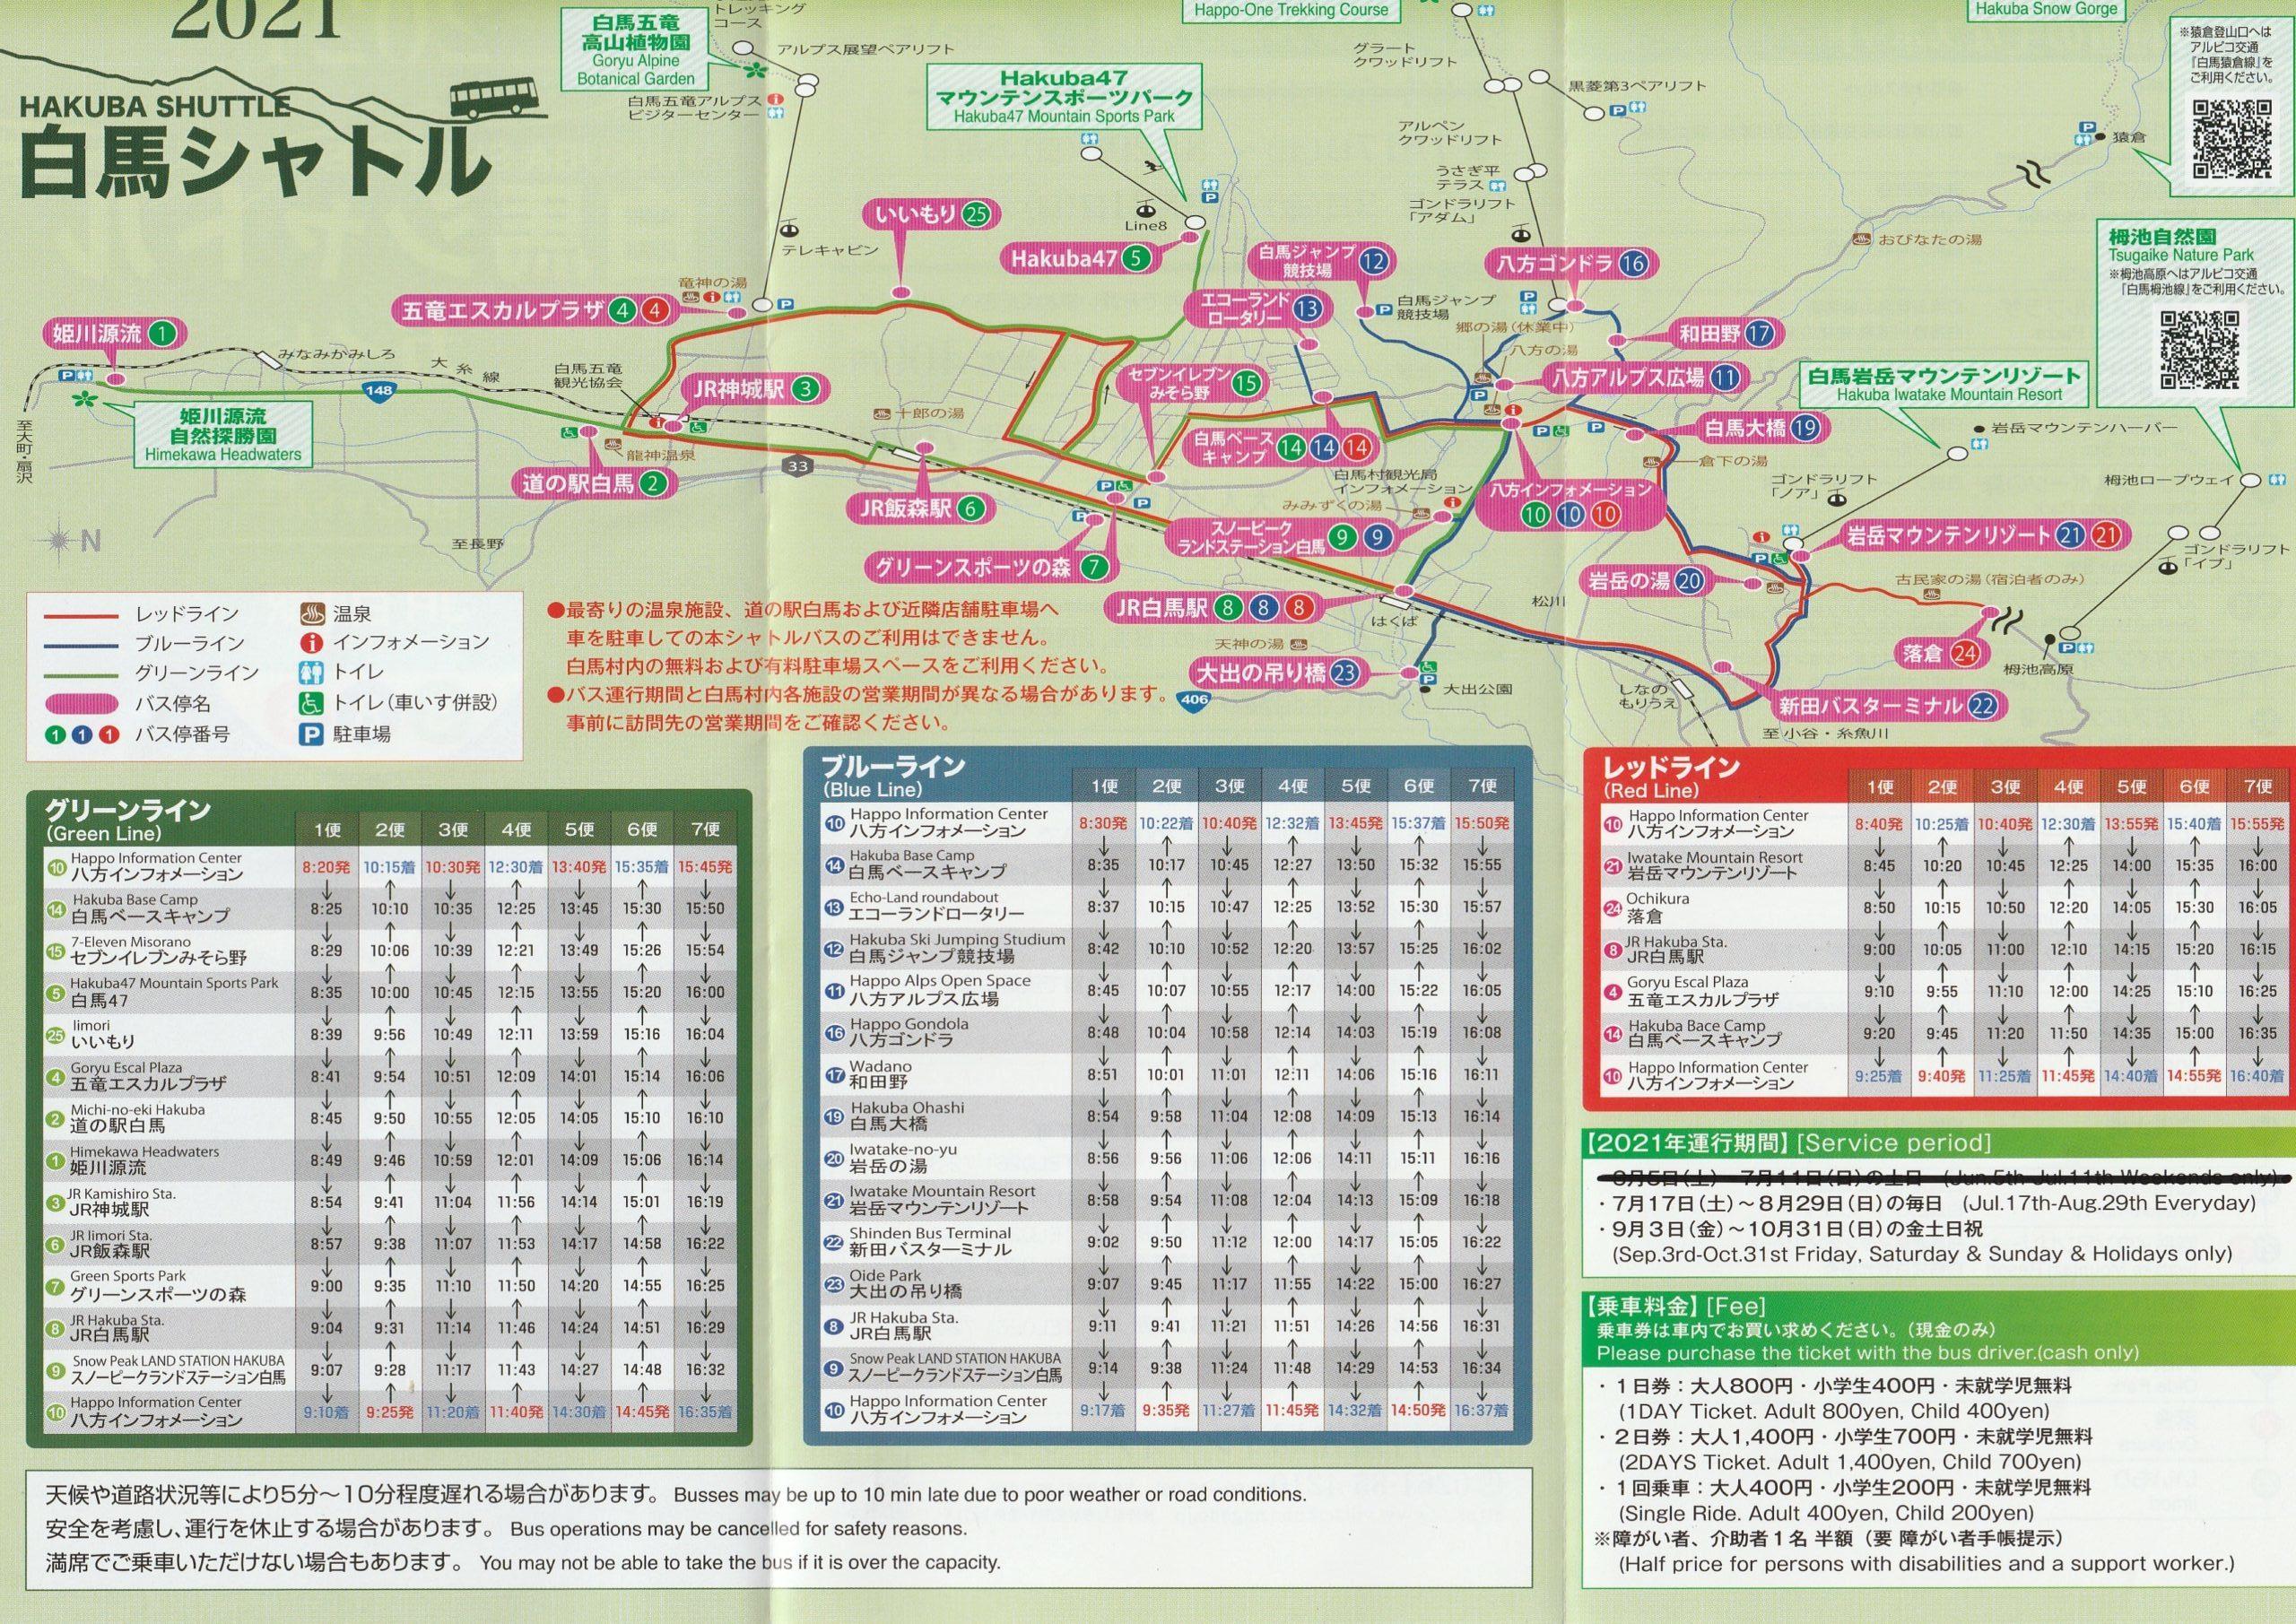 2021 Hakuba Summer Shuttle Map